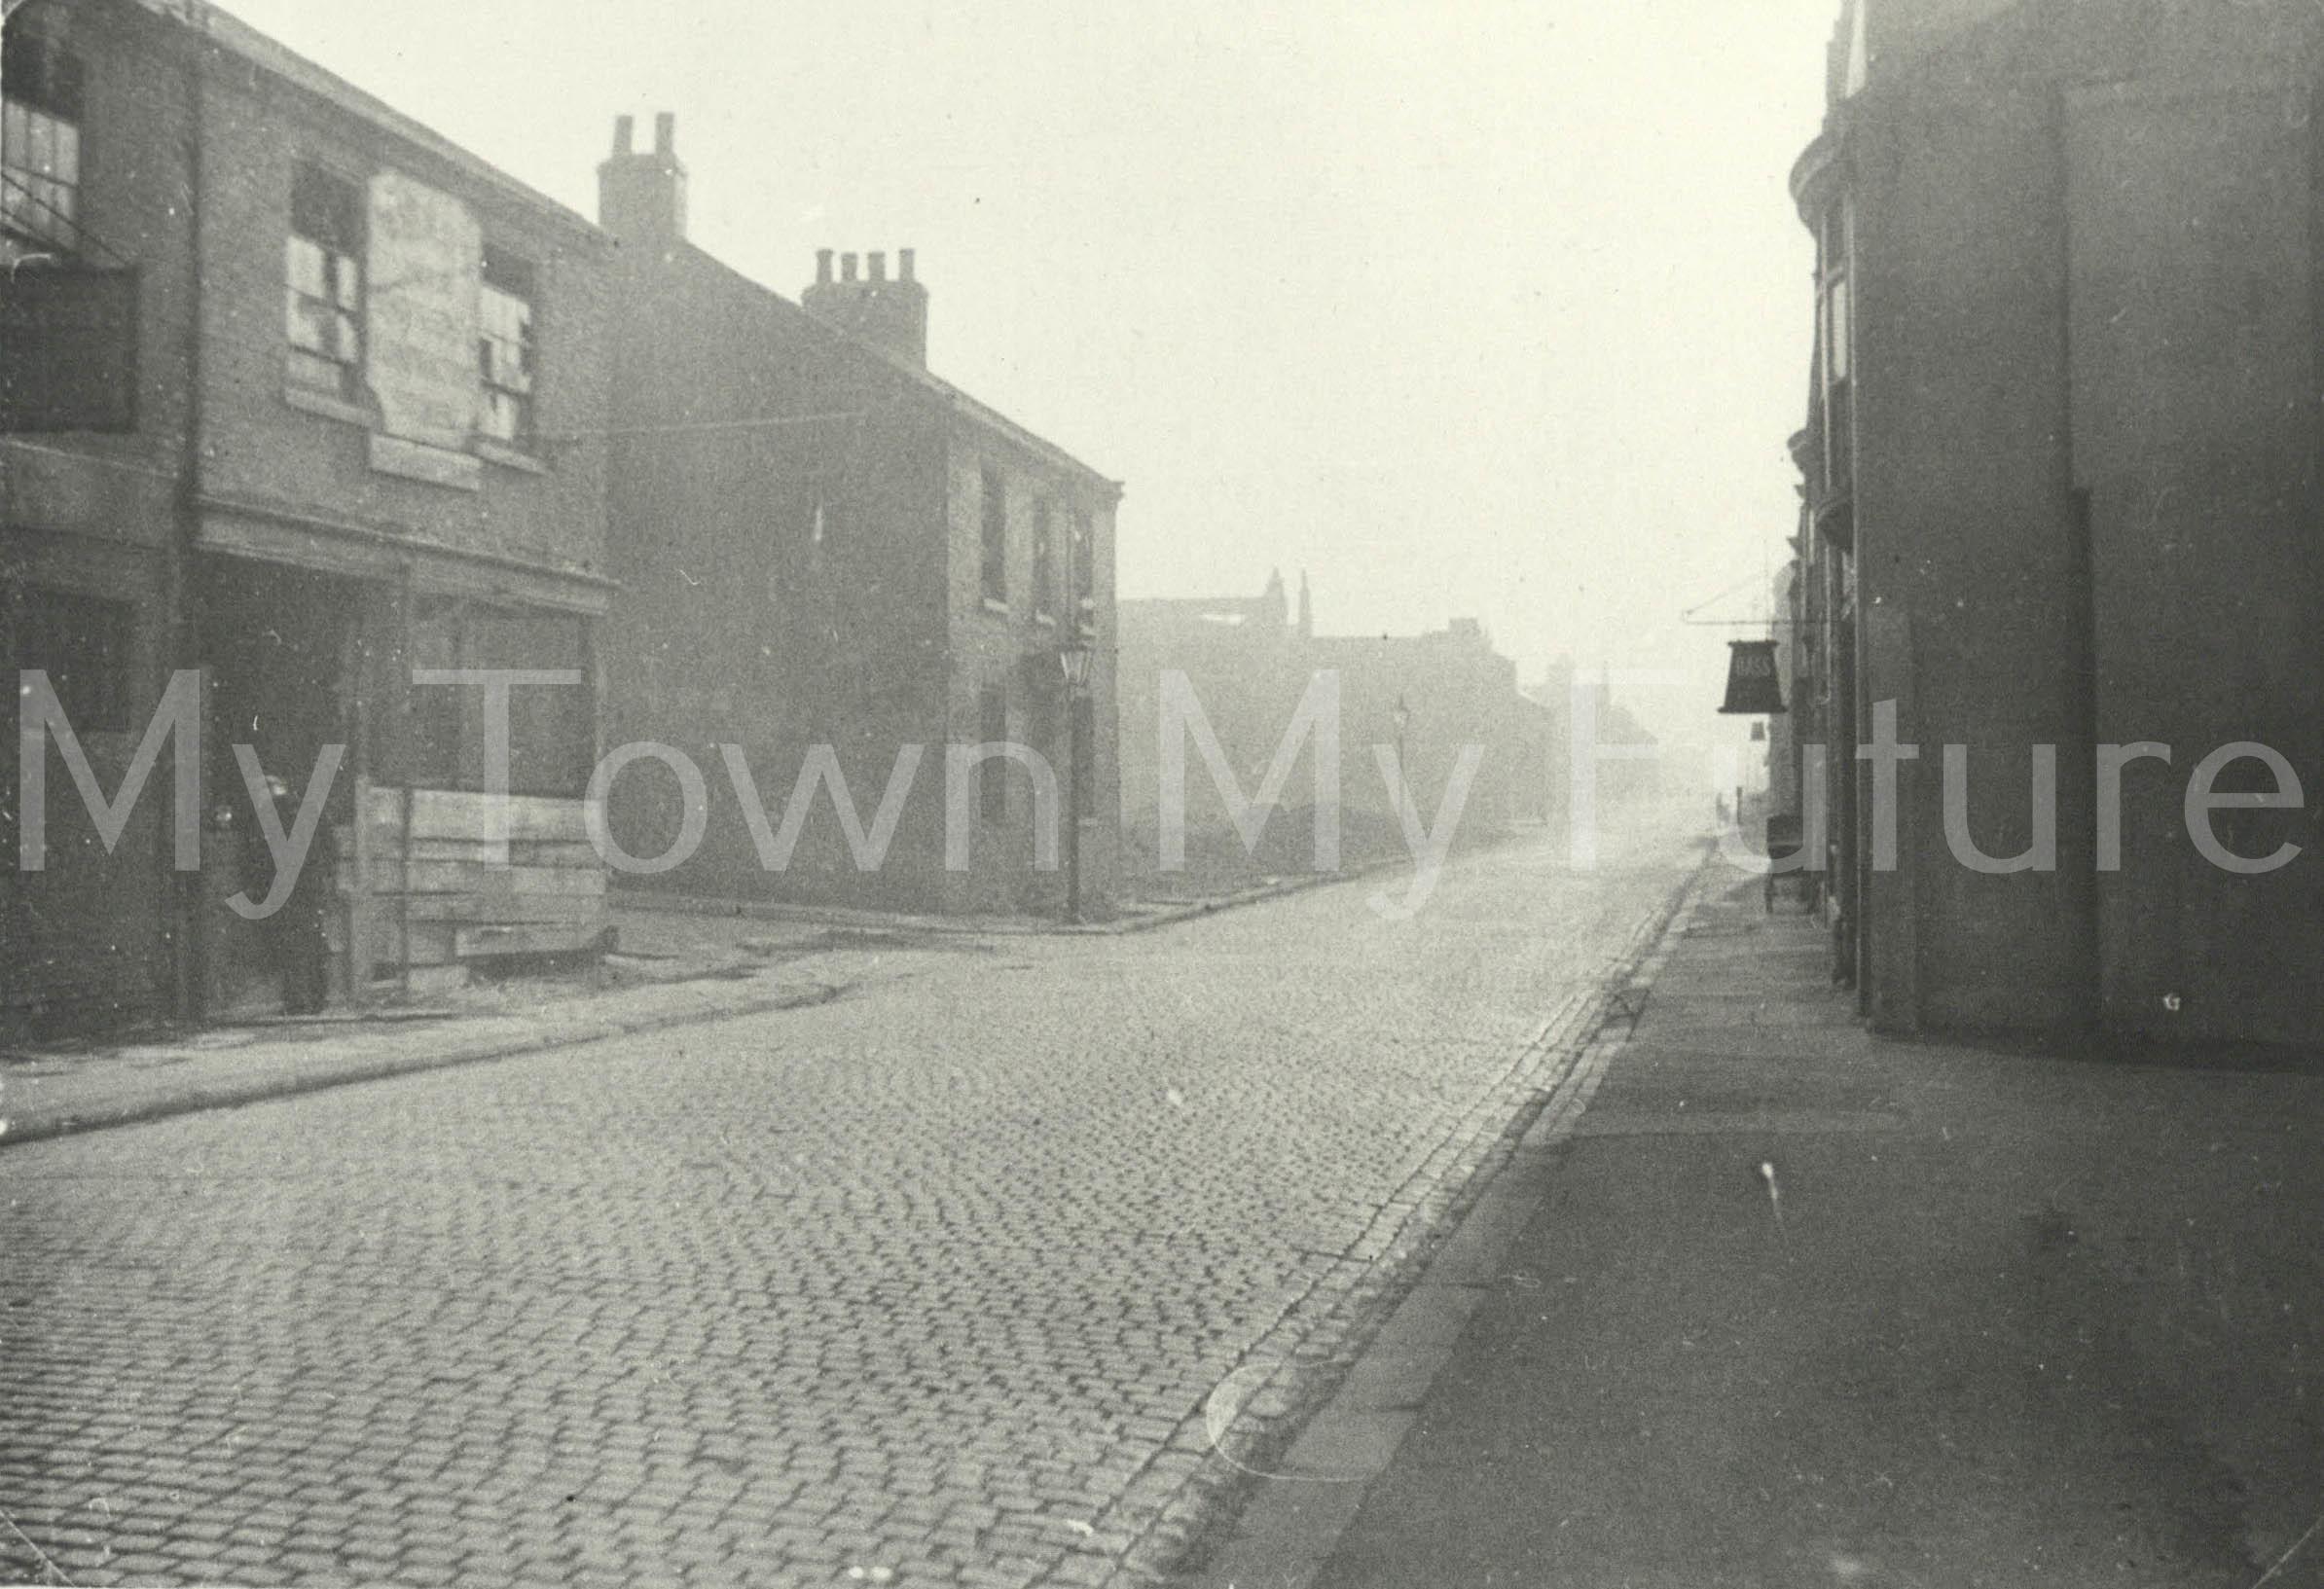 Stockton Street, Middlesbrough (1955)